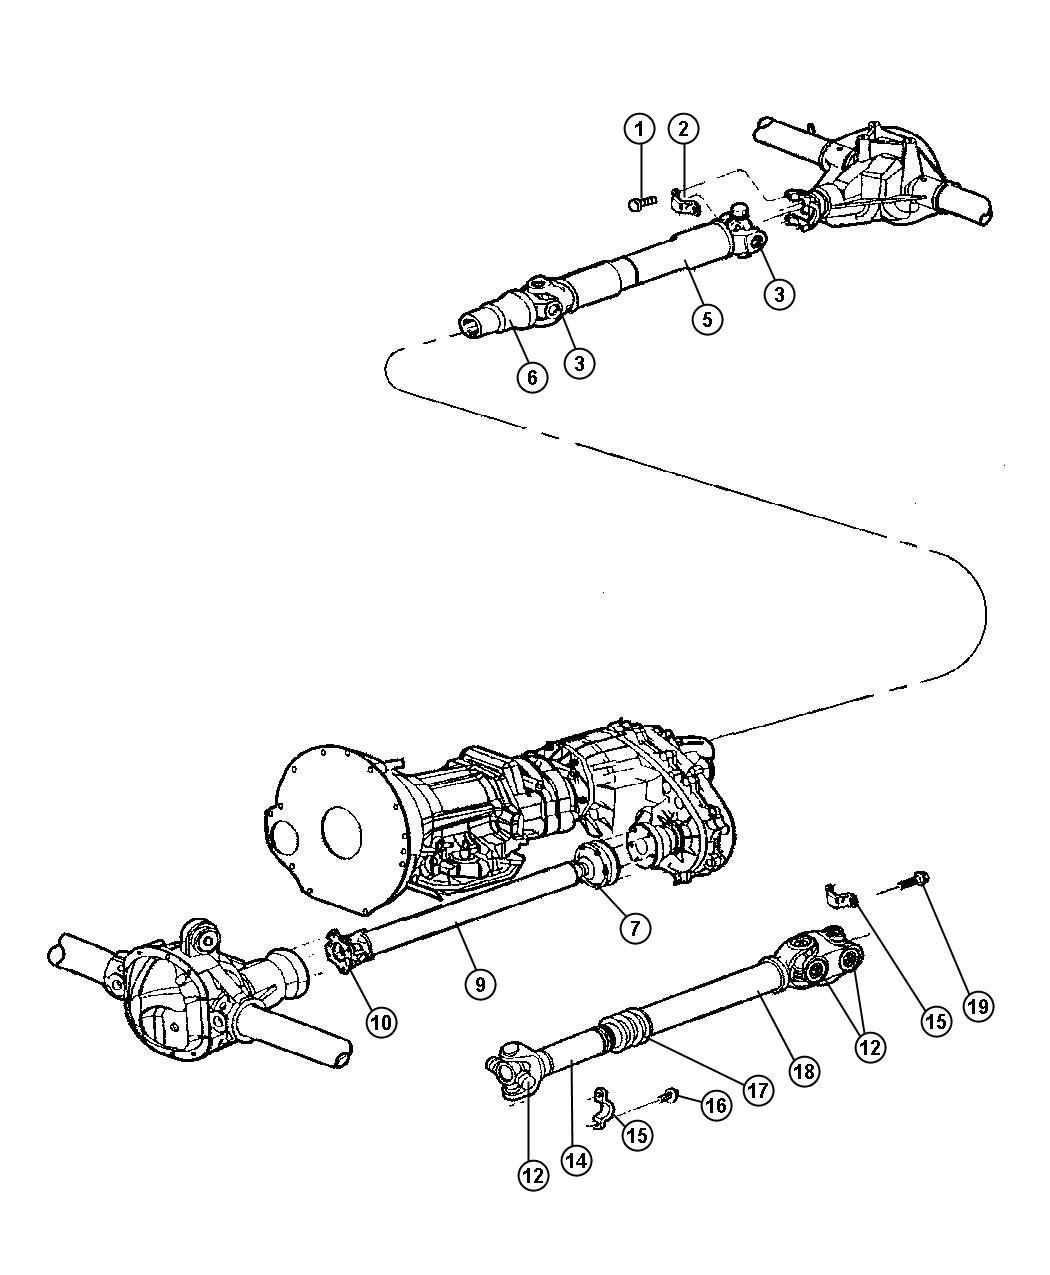 2001 Dodge Boot. Driveshaft. Fbitransfer, clamps